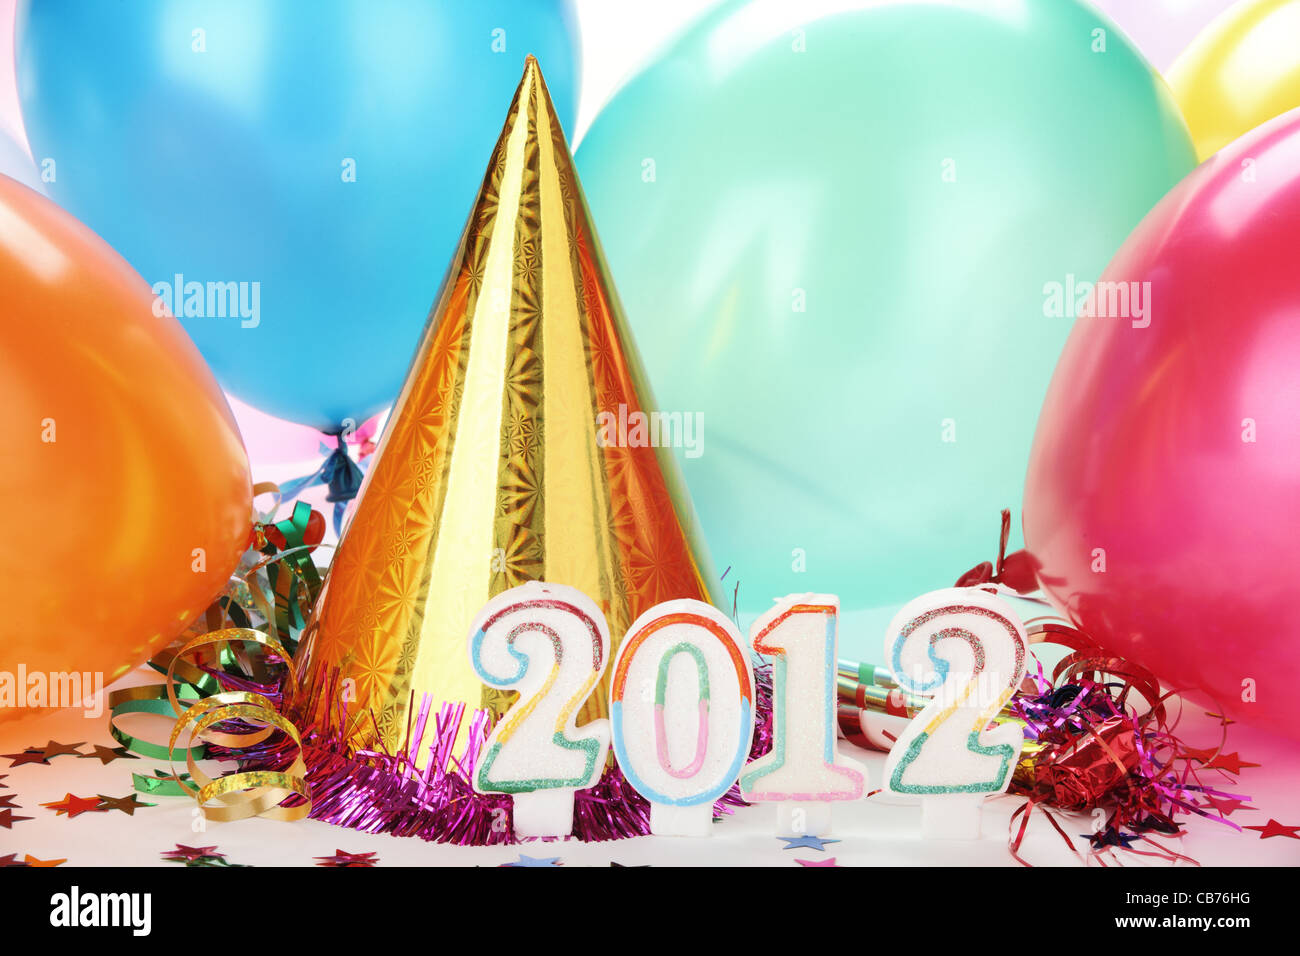 2012 New Year Decoration - Stock Image